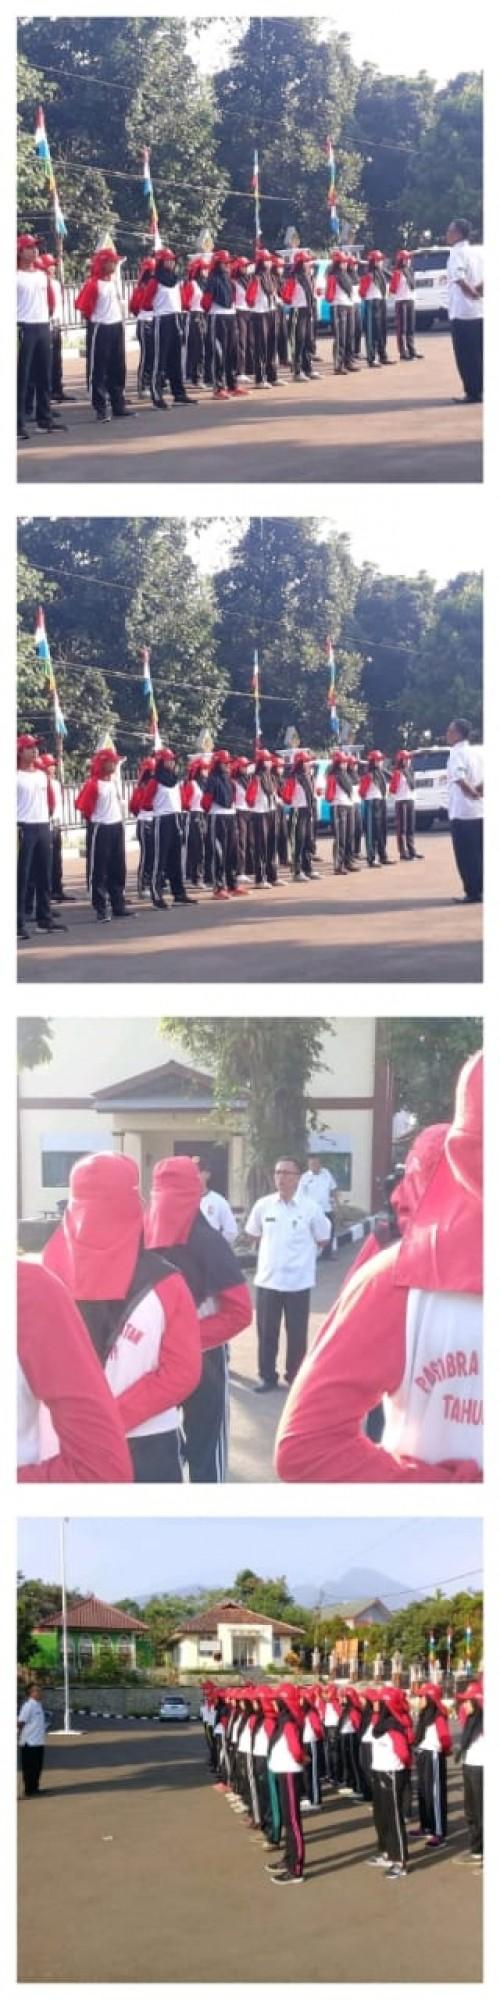 Latihan Persiapan Paskibra kecamatan tamansari